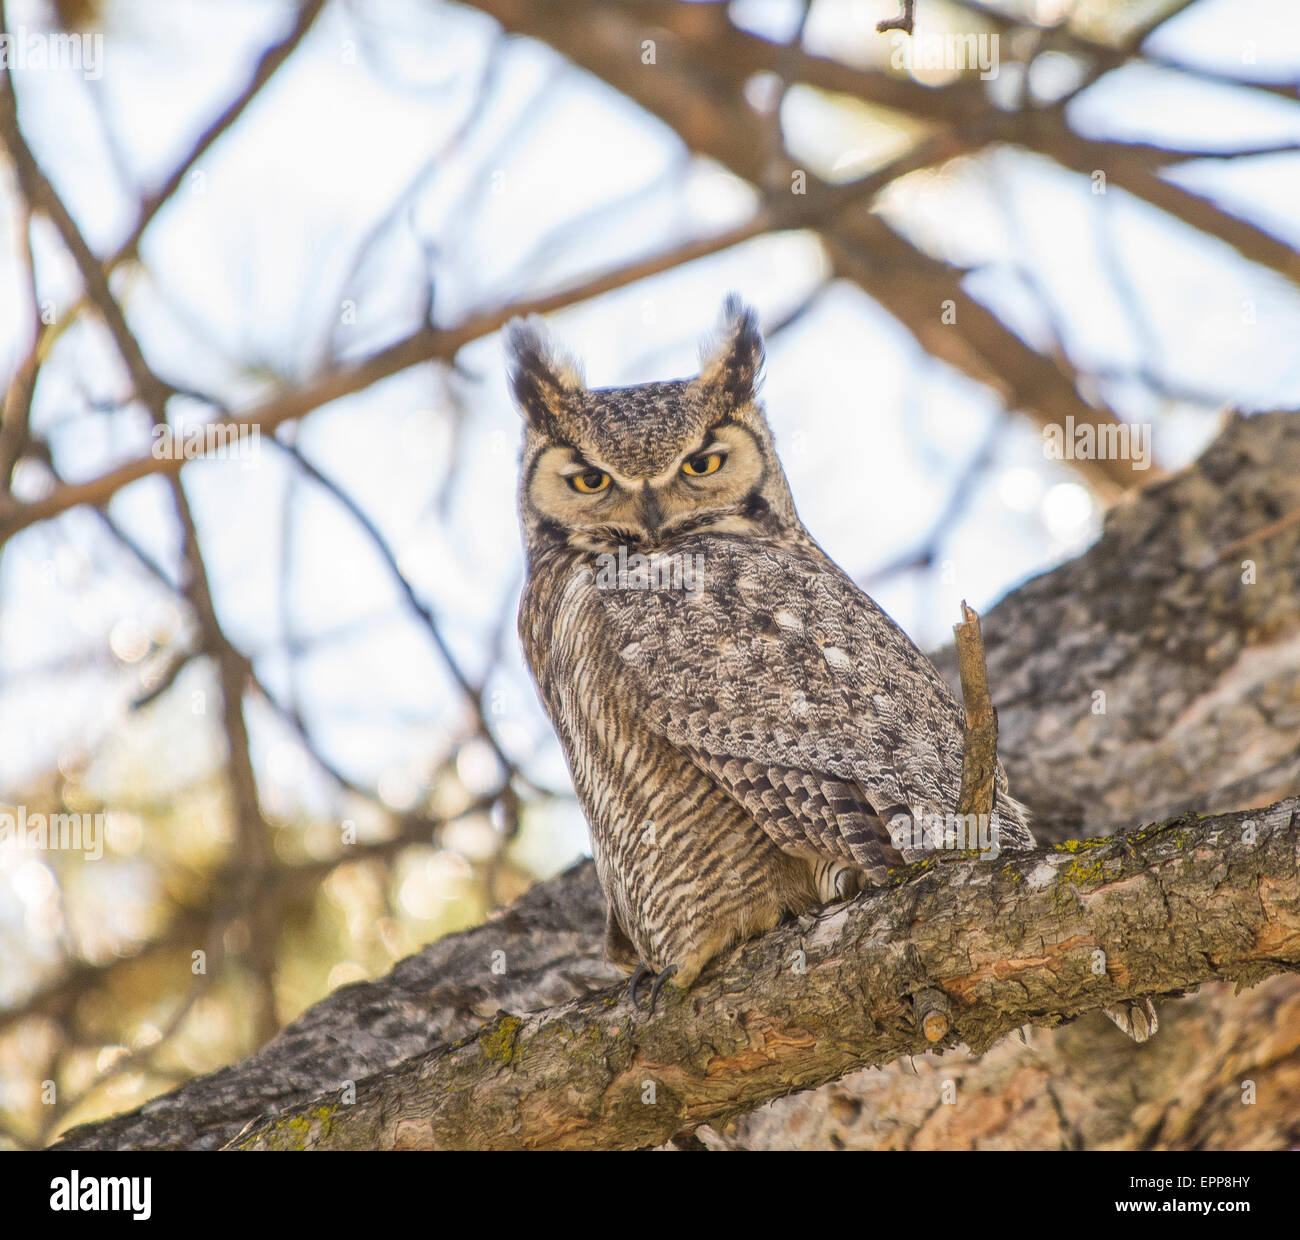 Owls,Great Horned Owl perched on a pine tree limb. Boise, Idaho,USA - Stock Image